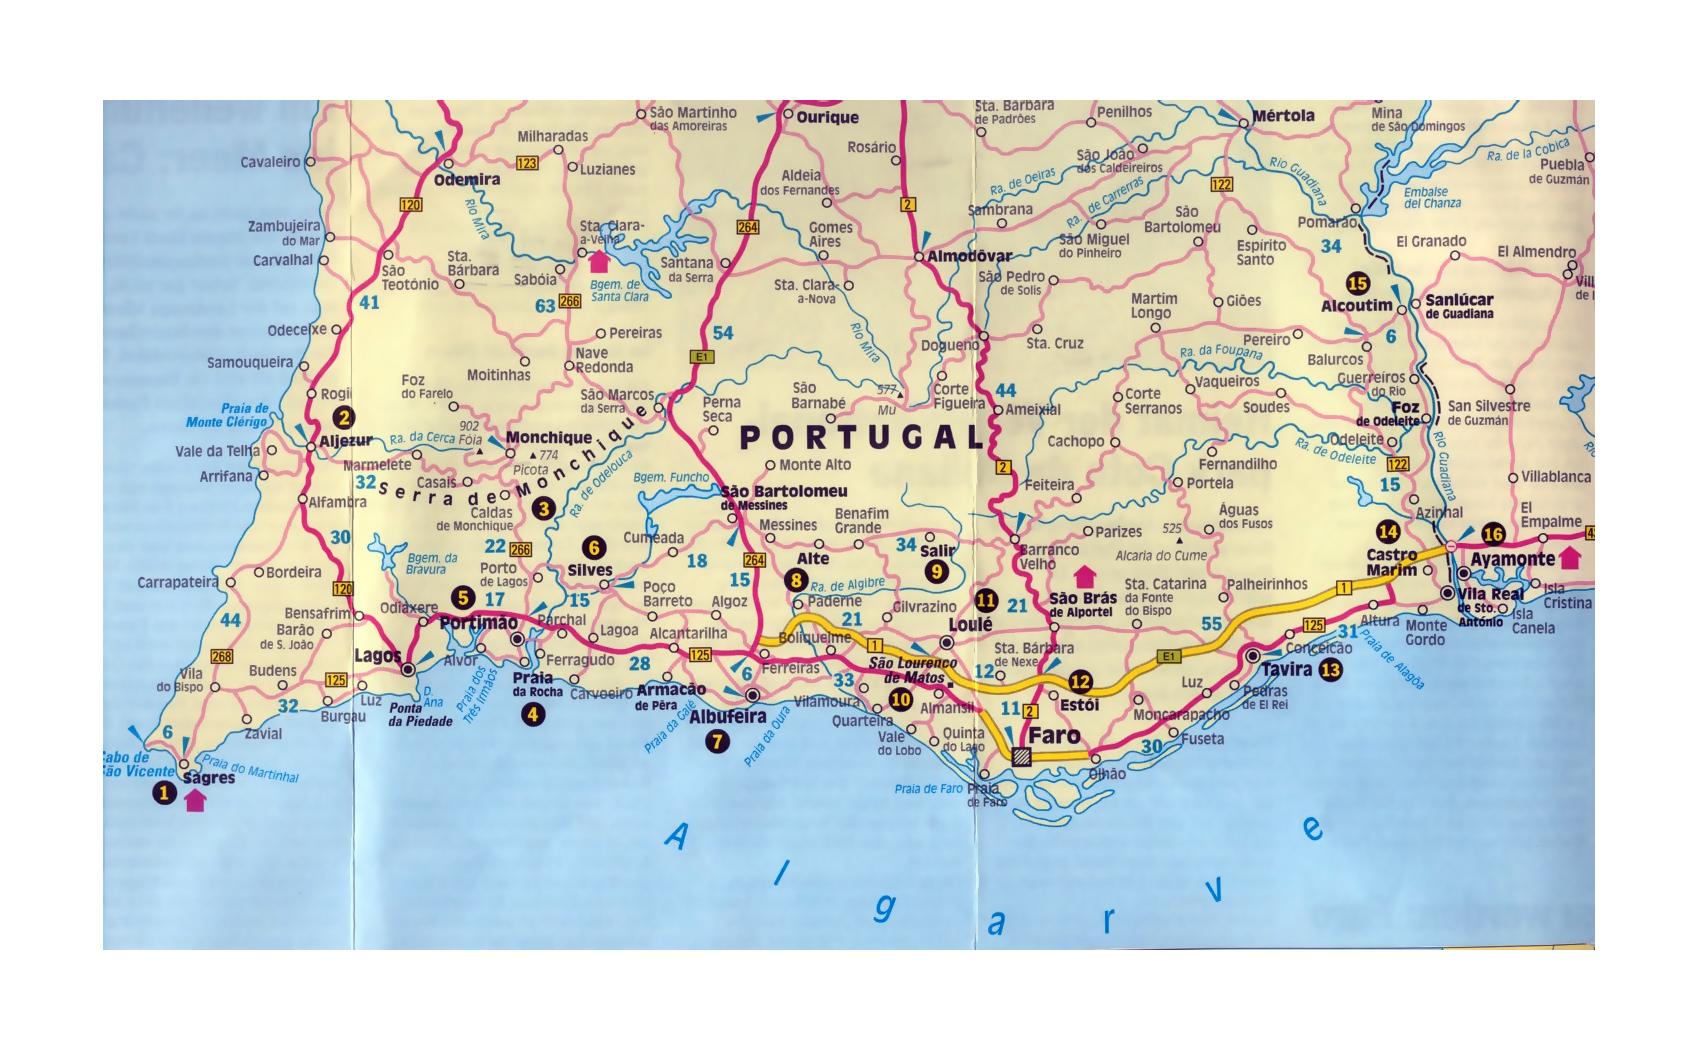 Map Of Algarve Detailed road map of Algarve with other marks | Algarve | Portugal  Map Of Algarve